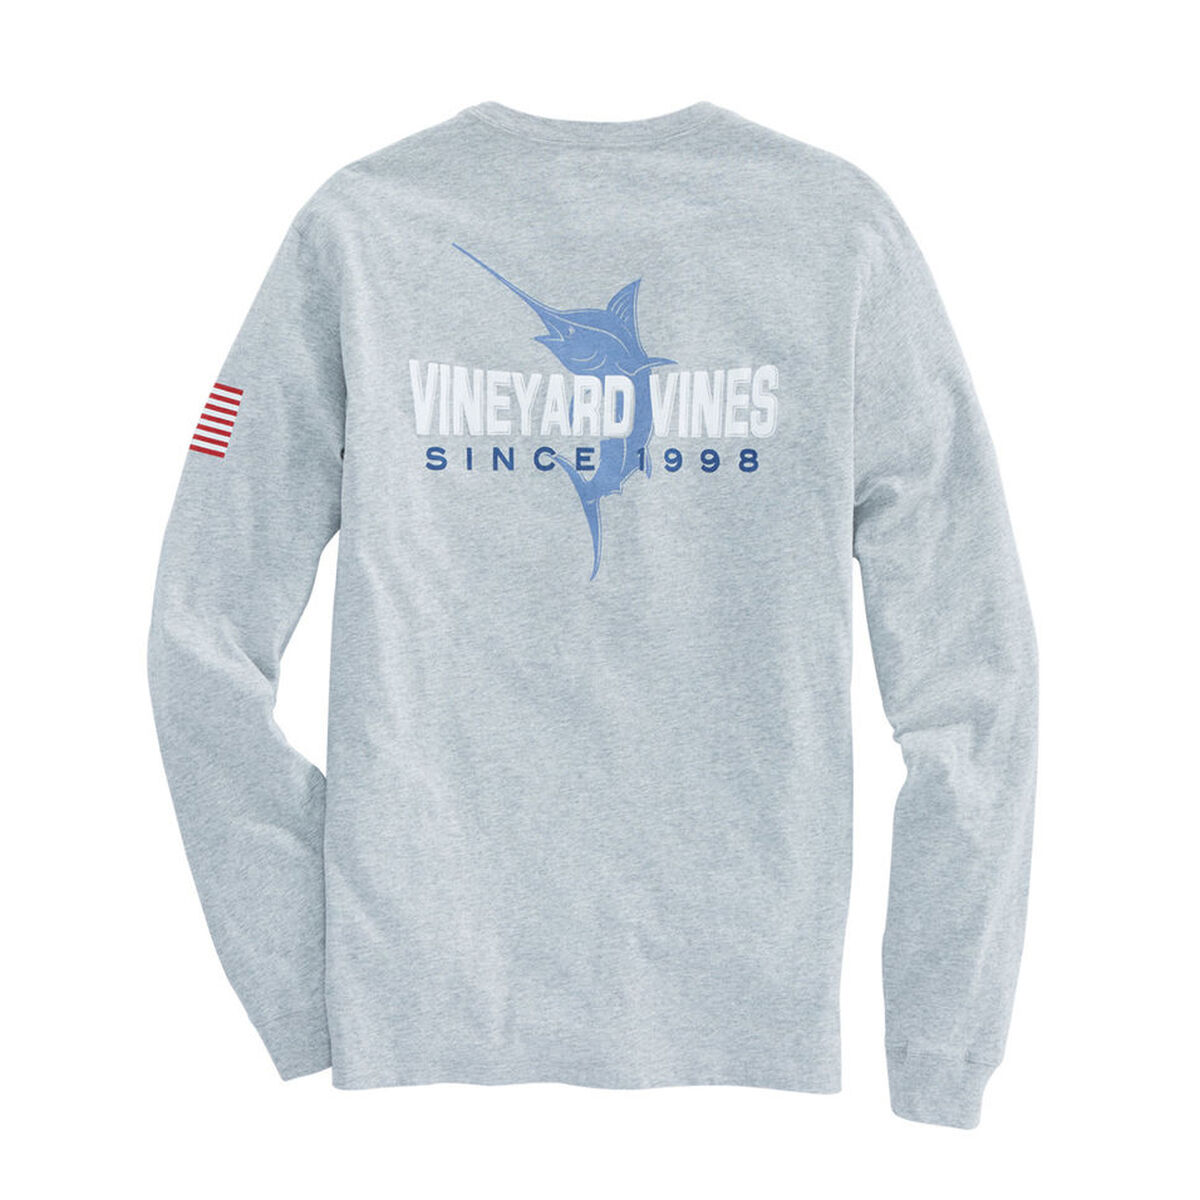 5787c2d17 Vineyard Vines Long-Sleeve 98 Marlin Pocket T-Shirt   PGA TOUR ...